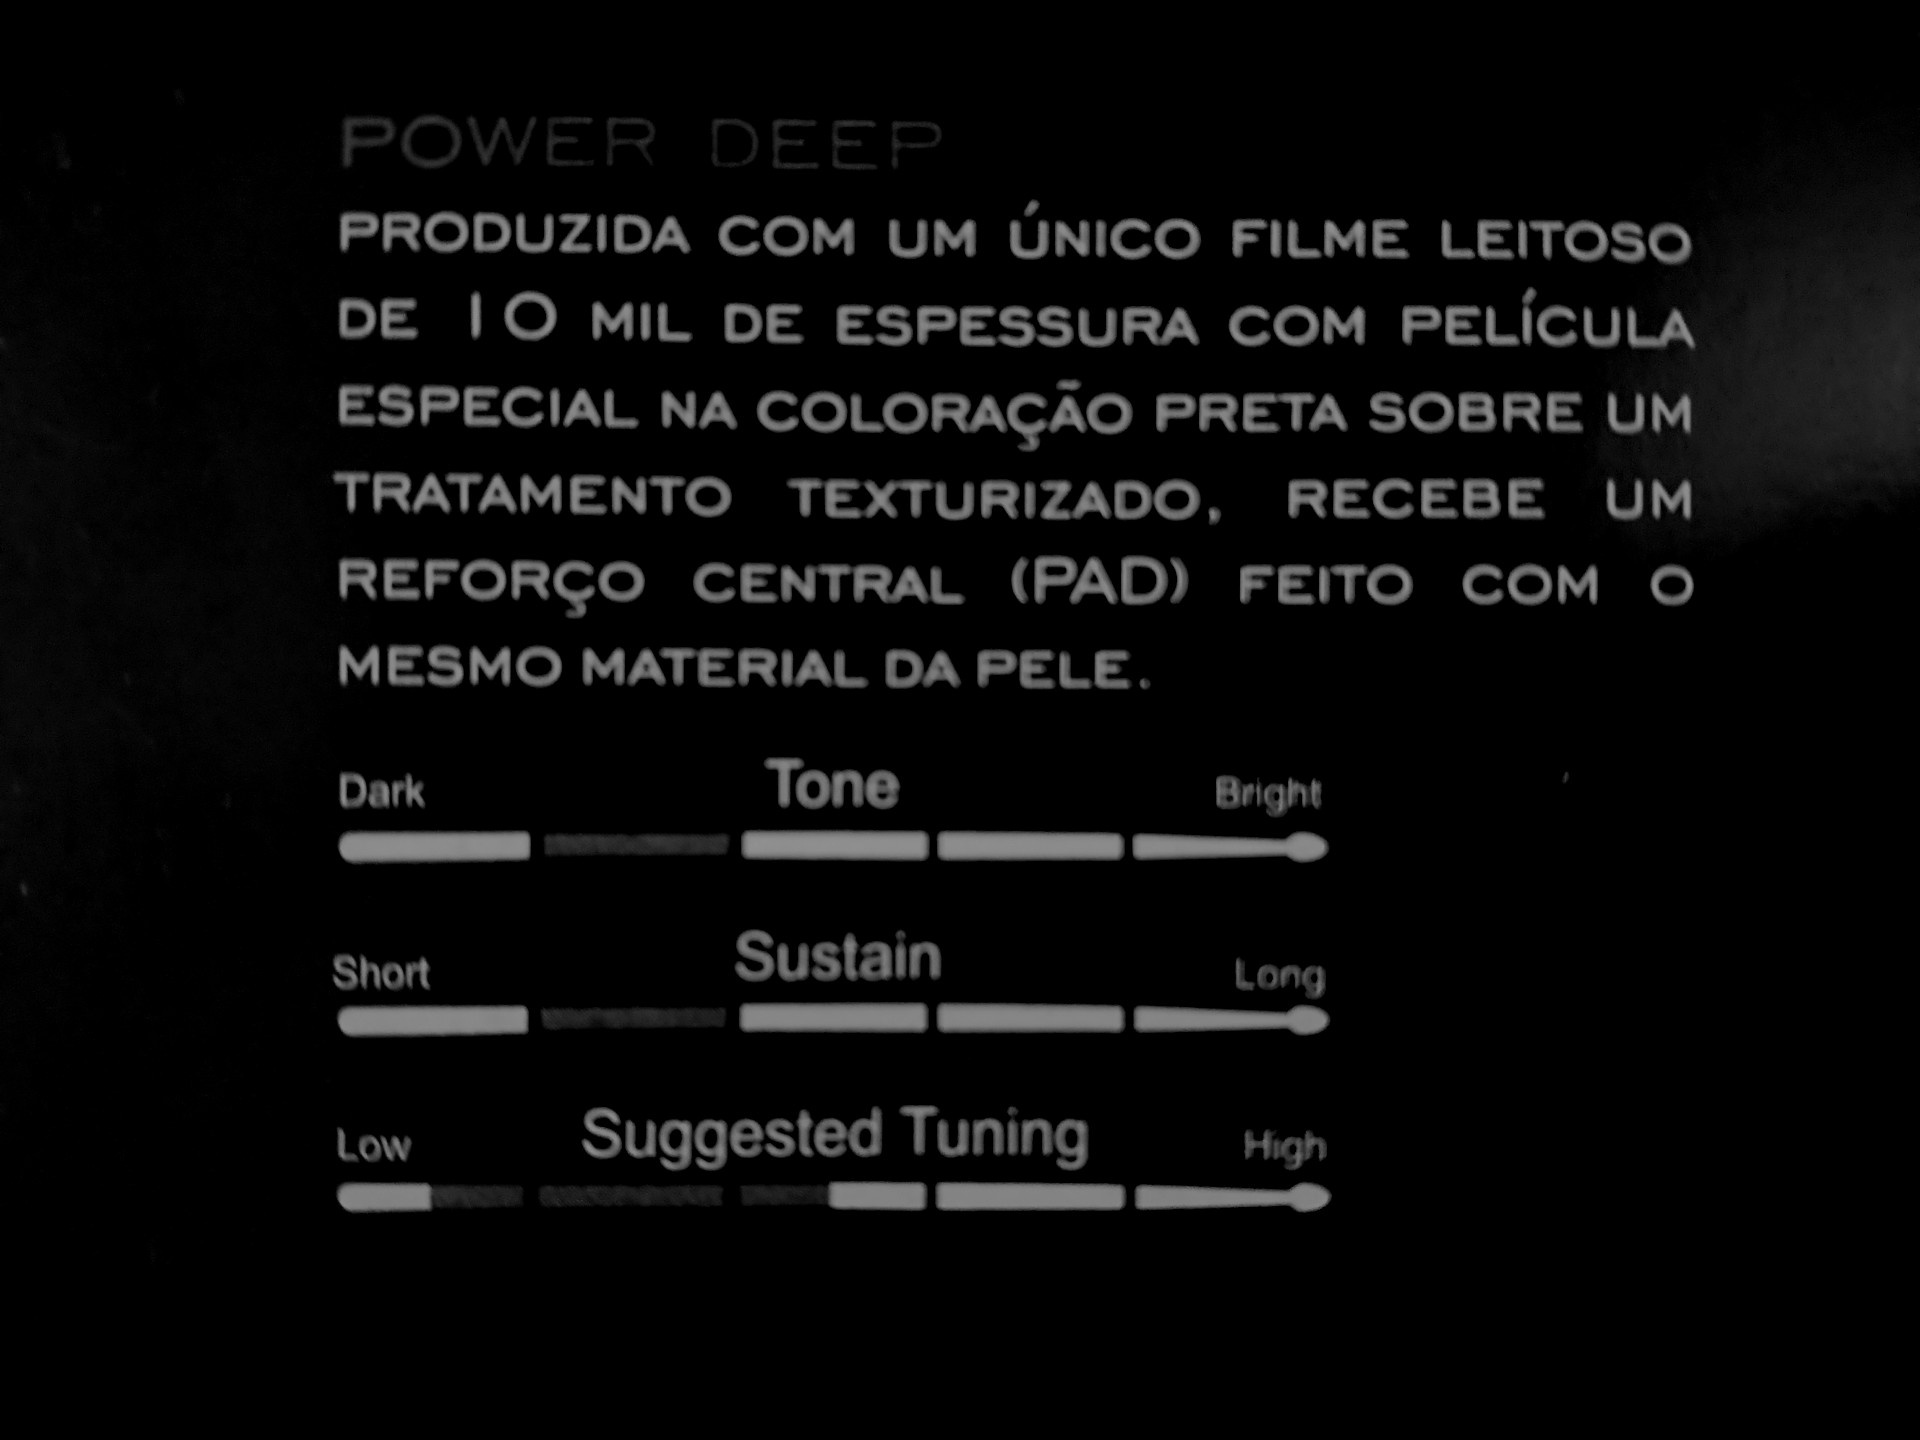 "Pele texturizada POWER DEEP C/ PAD 13"" Dudu Portes, LUEN."